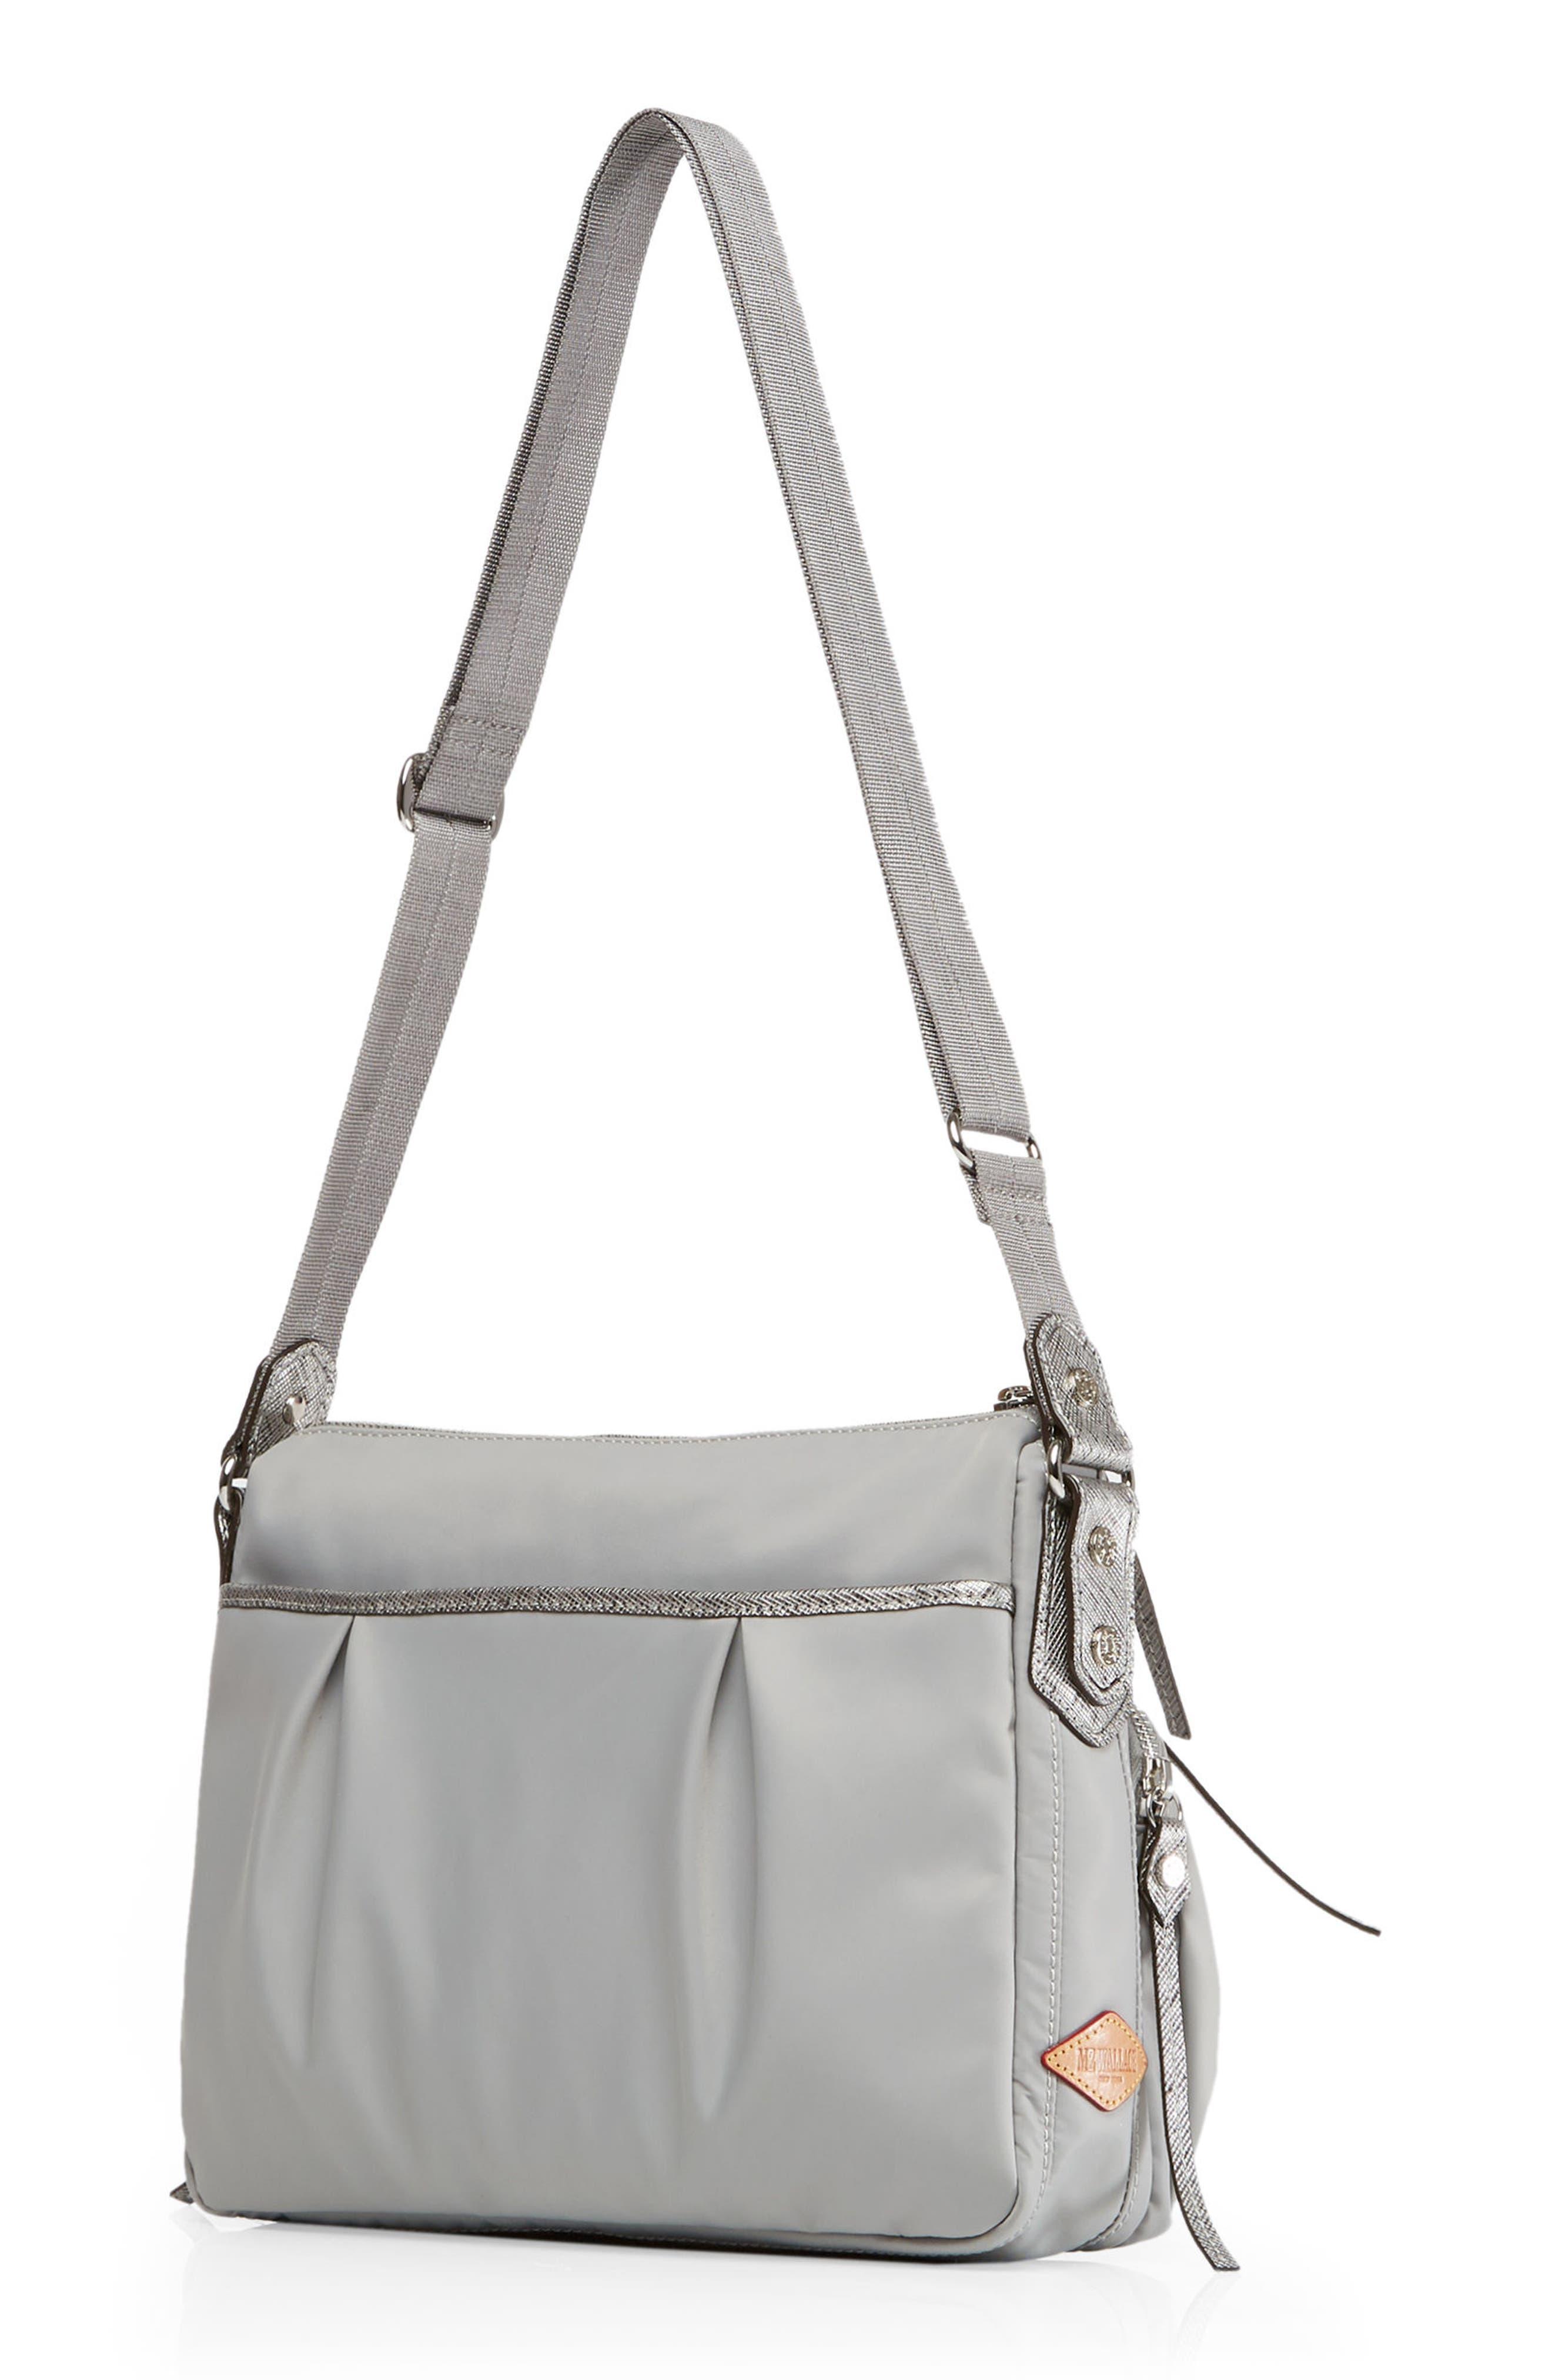 Paige Crossbody Bag,                             Alternate thumbnail 2, color,                             DOVE GREY